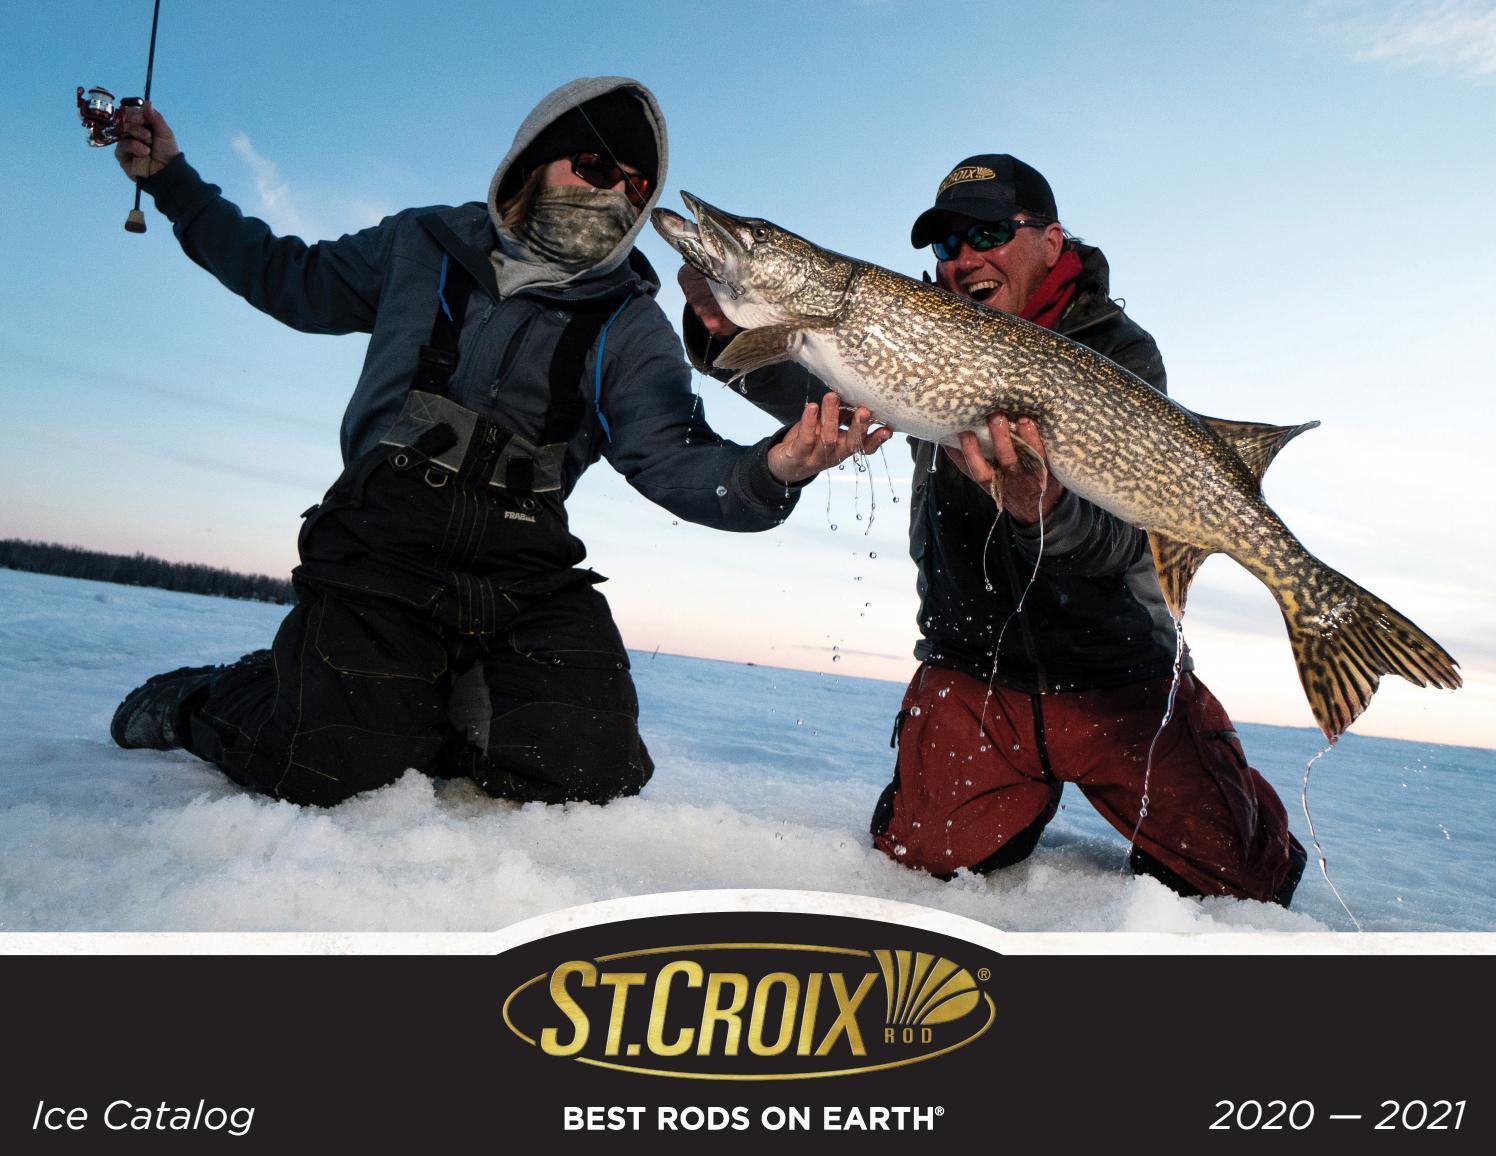 Croix Legend Black Ice Fishing Rod St